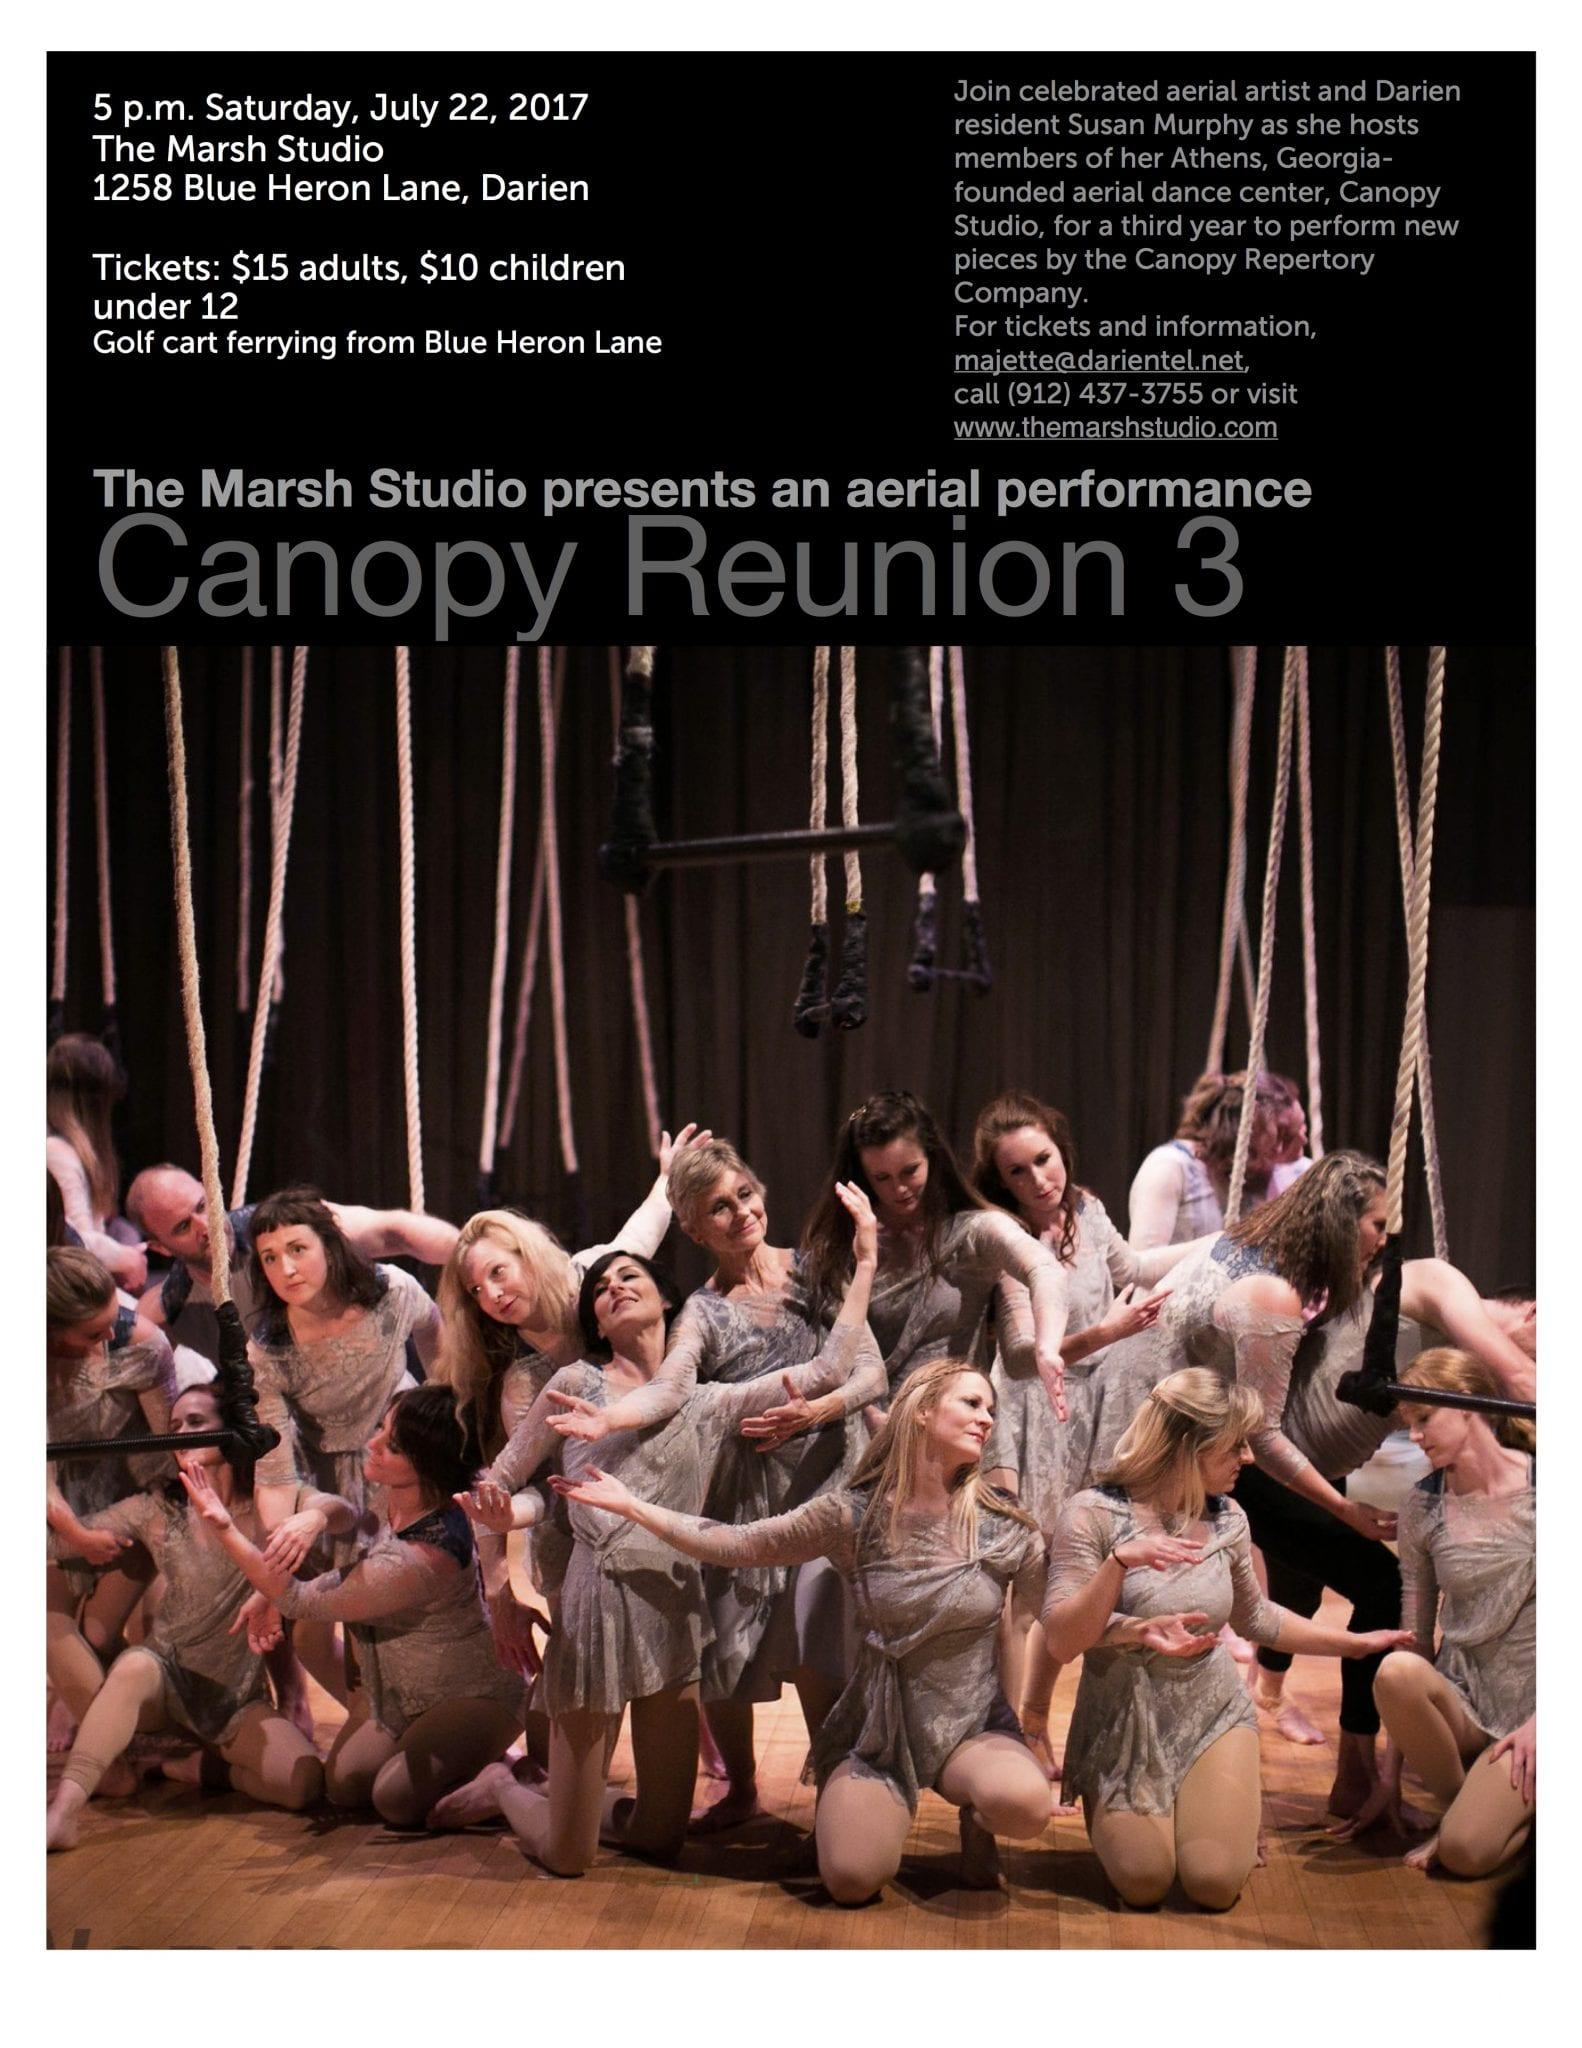 Canopy 3 Reunion 2017